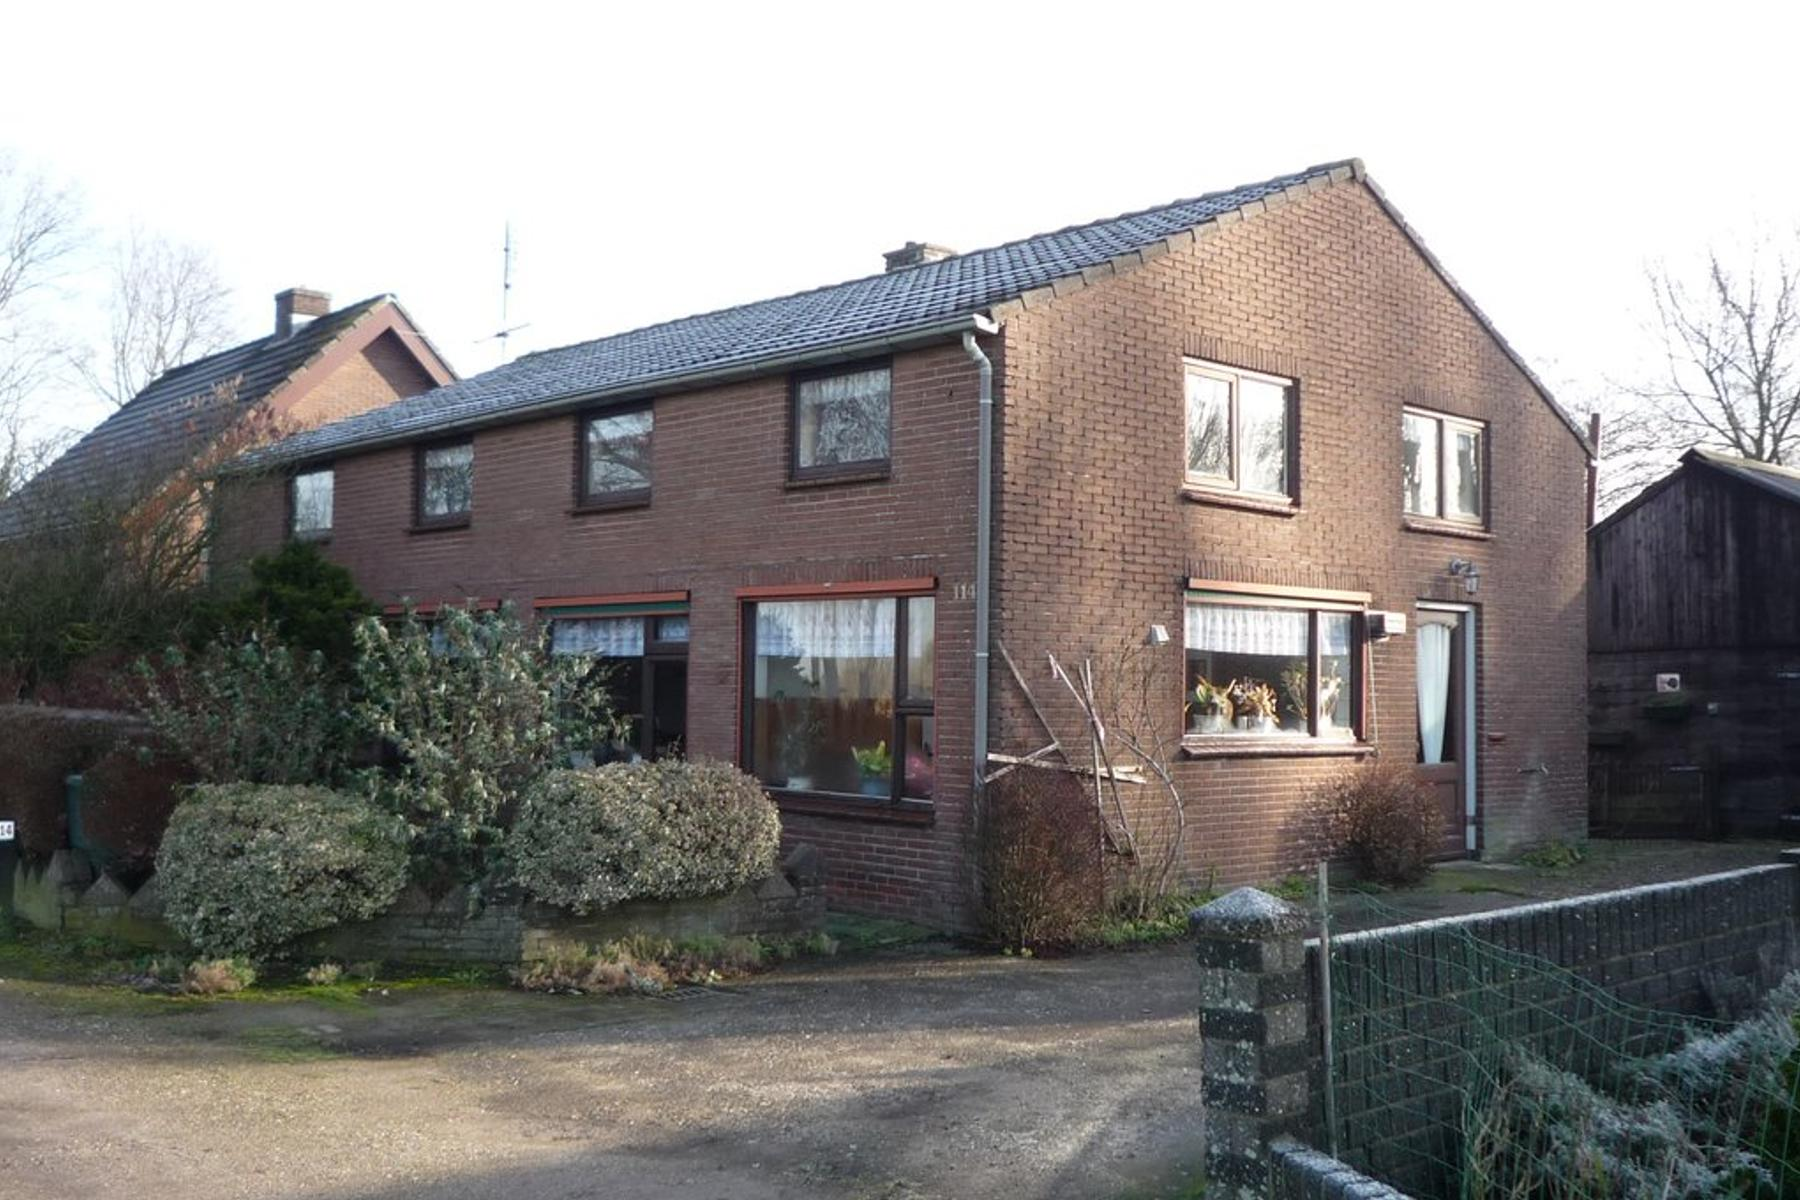 Laakweg 114 in Nijkerkerveen 3864 LG